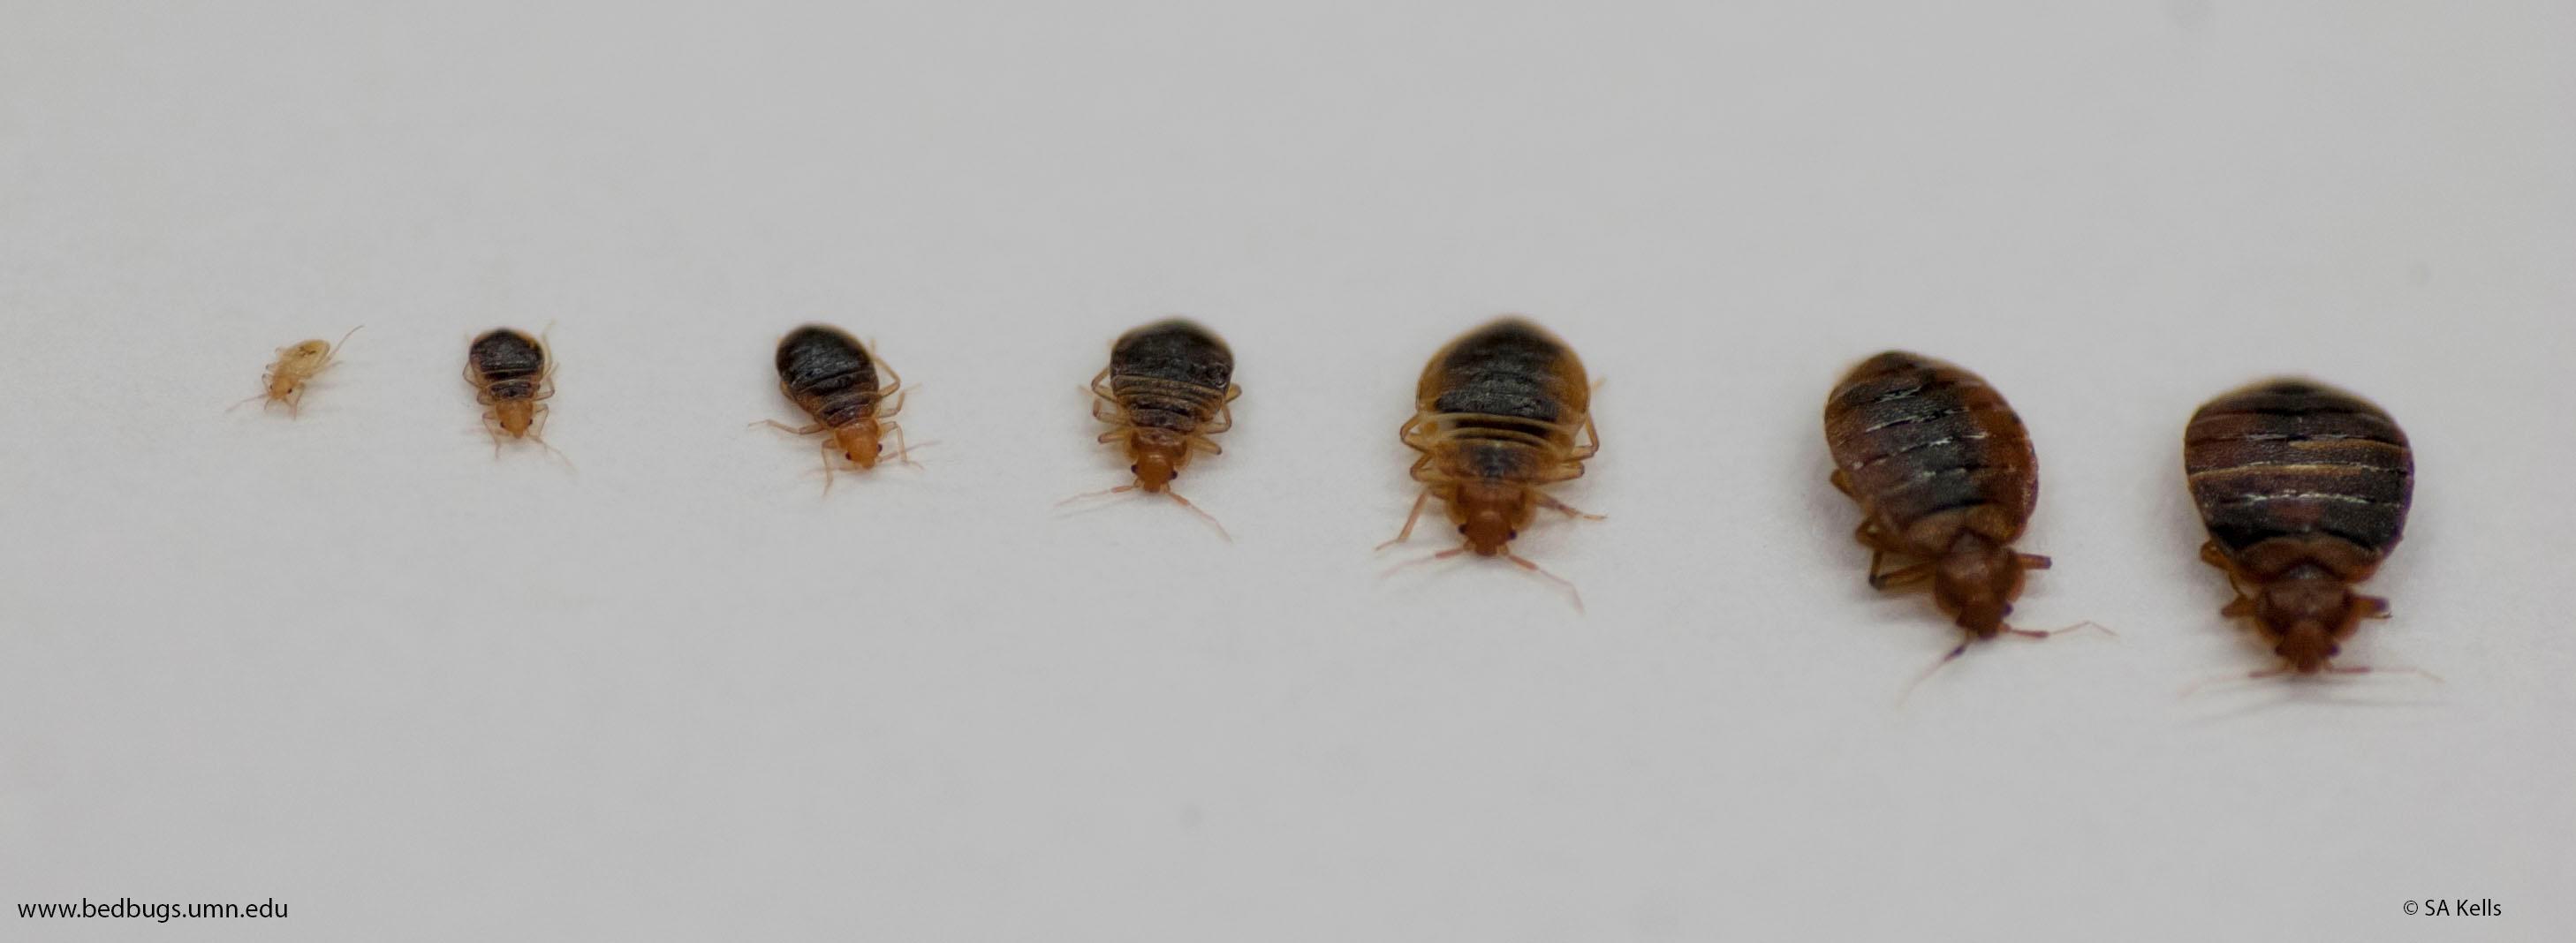 MNR Pest Solutions, Inc. image 3